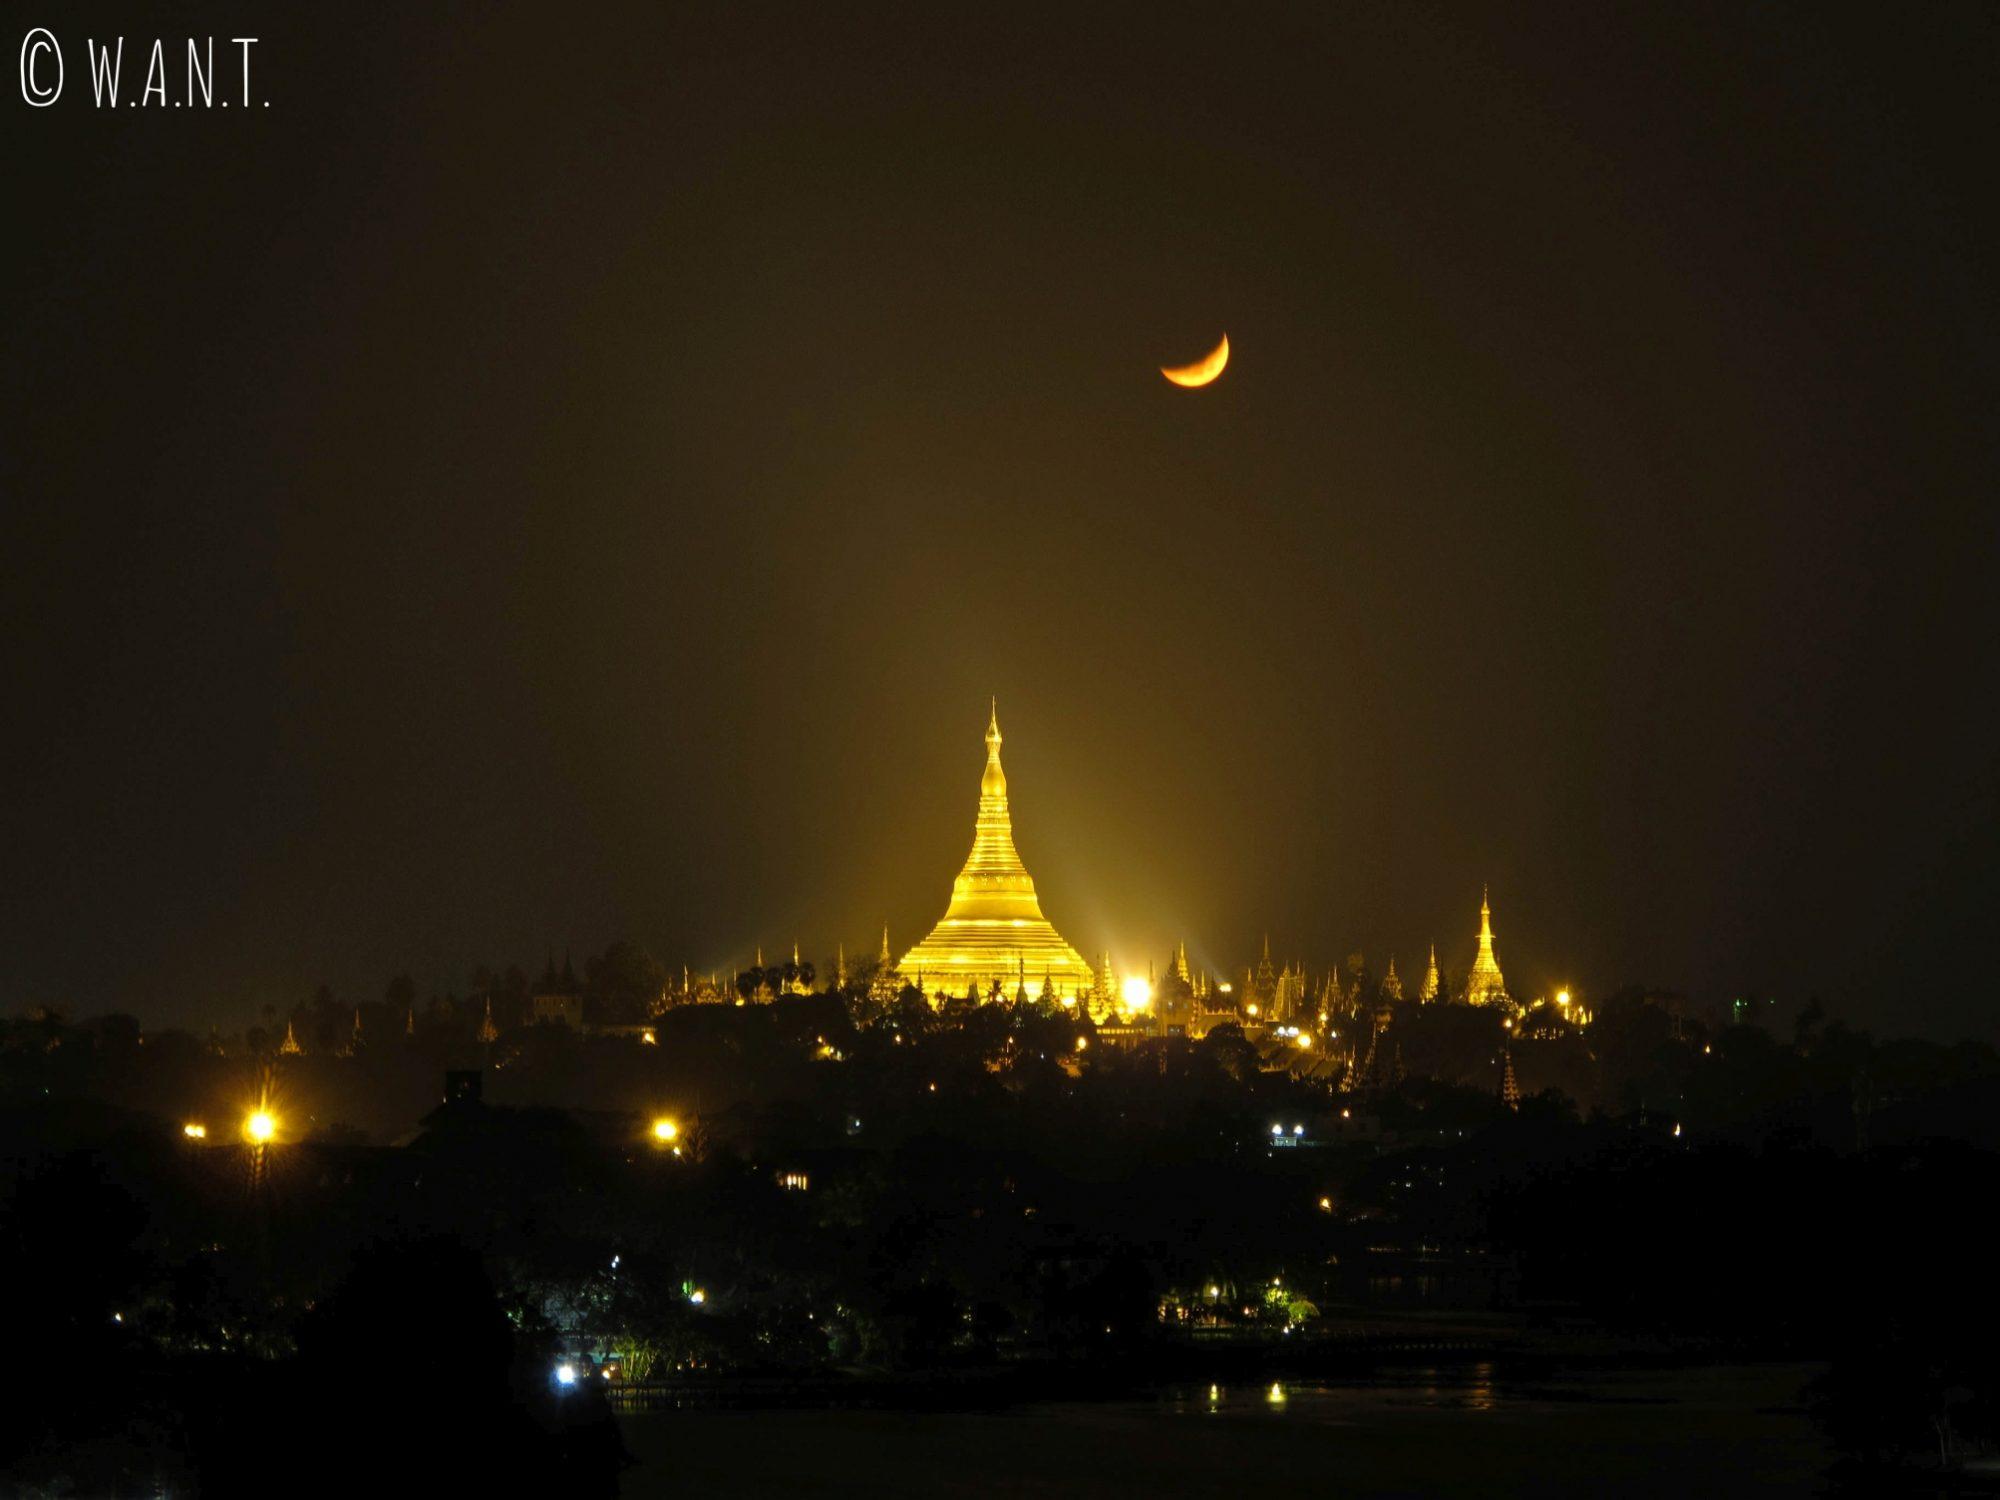 Vue nocturne de la pagode Shwedagon